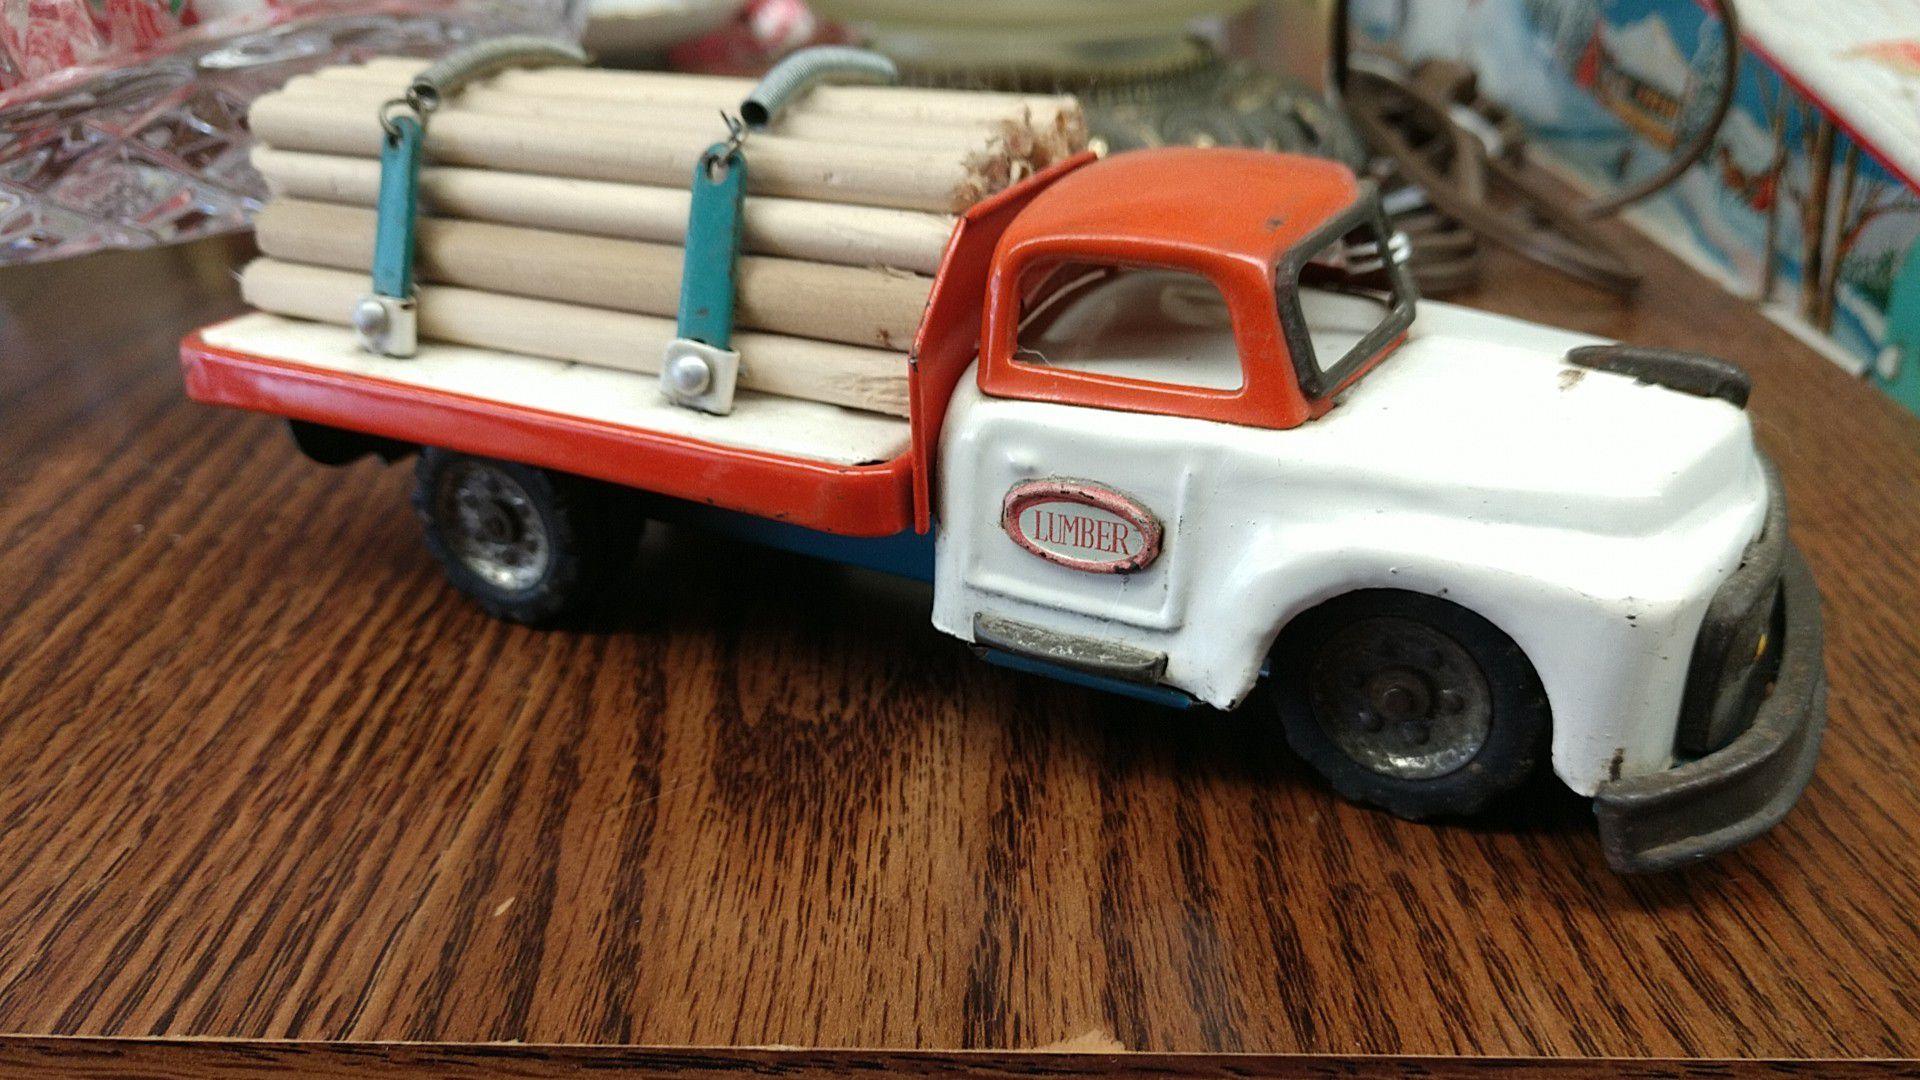 Vintage 1950s lumber truck toy